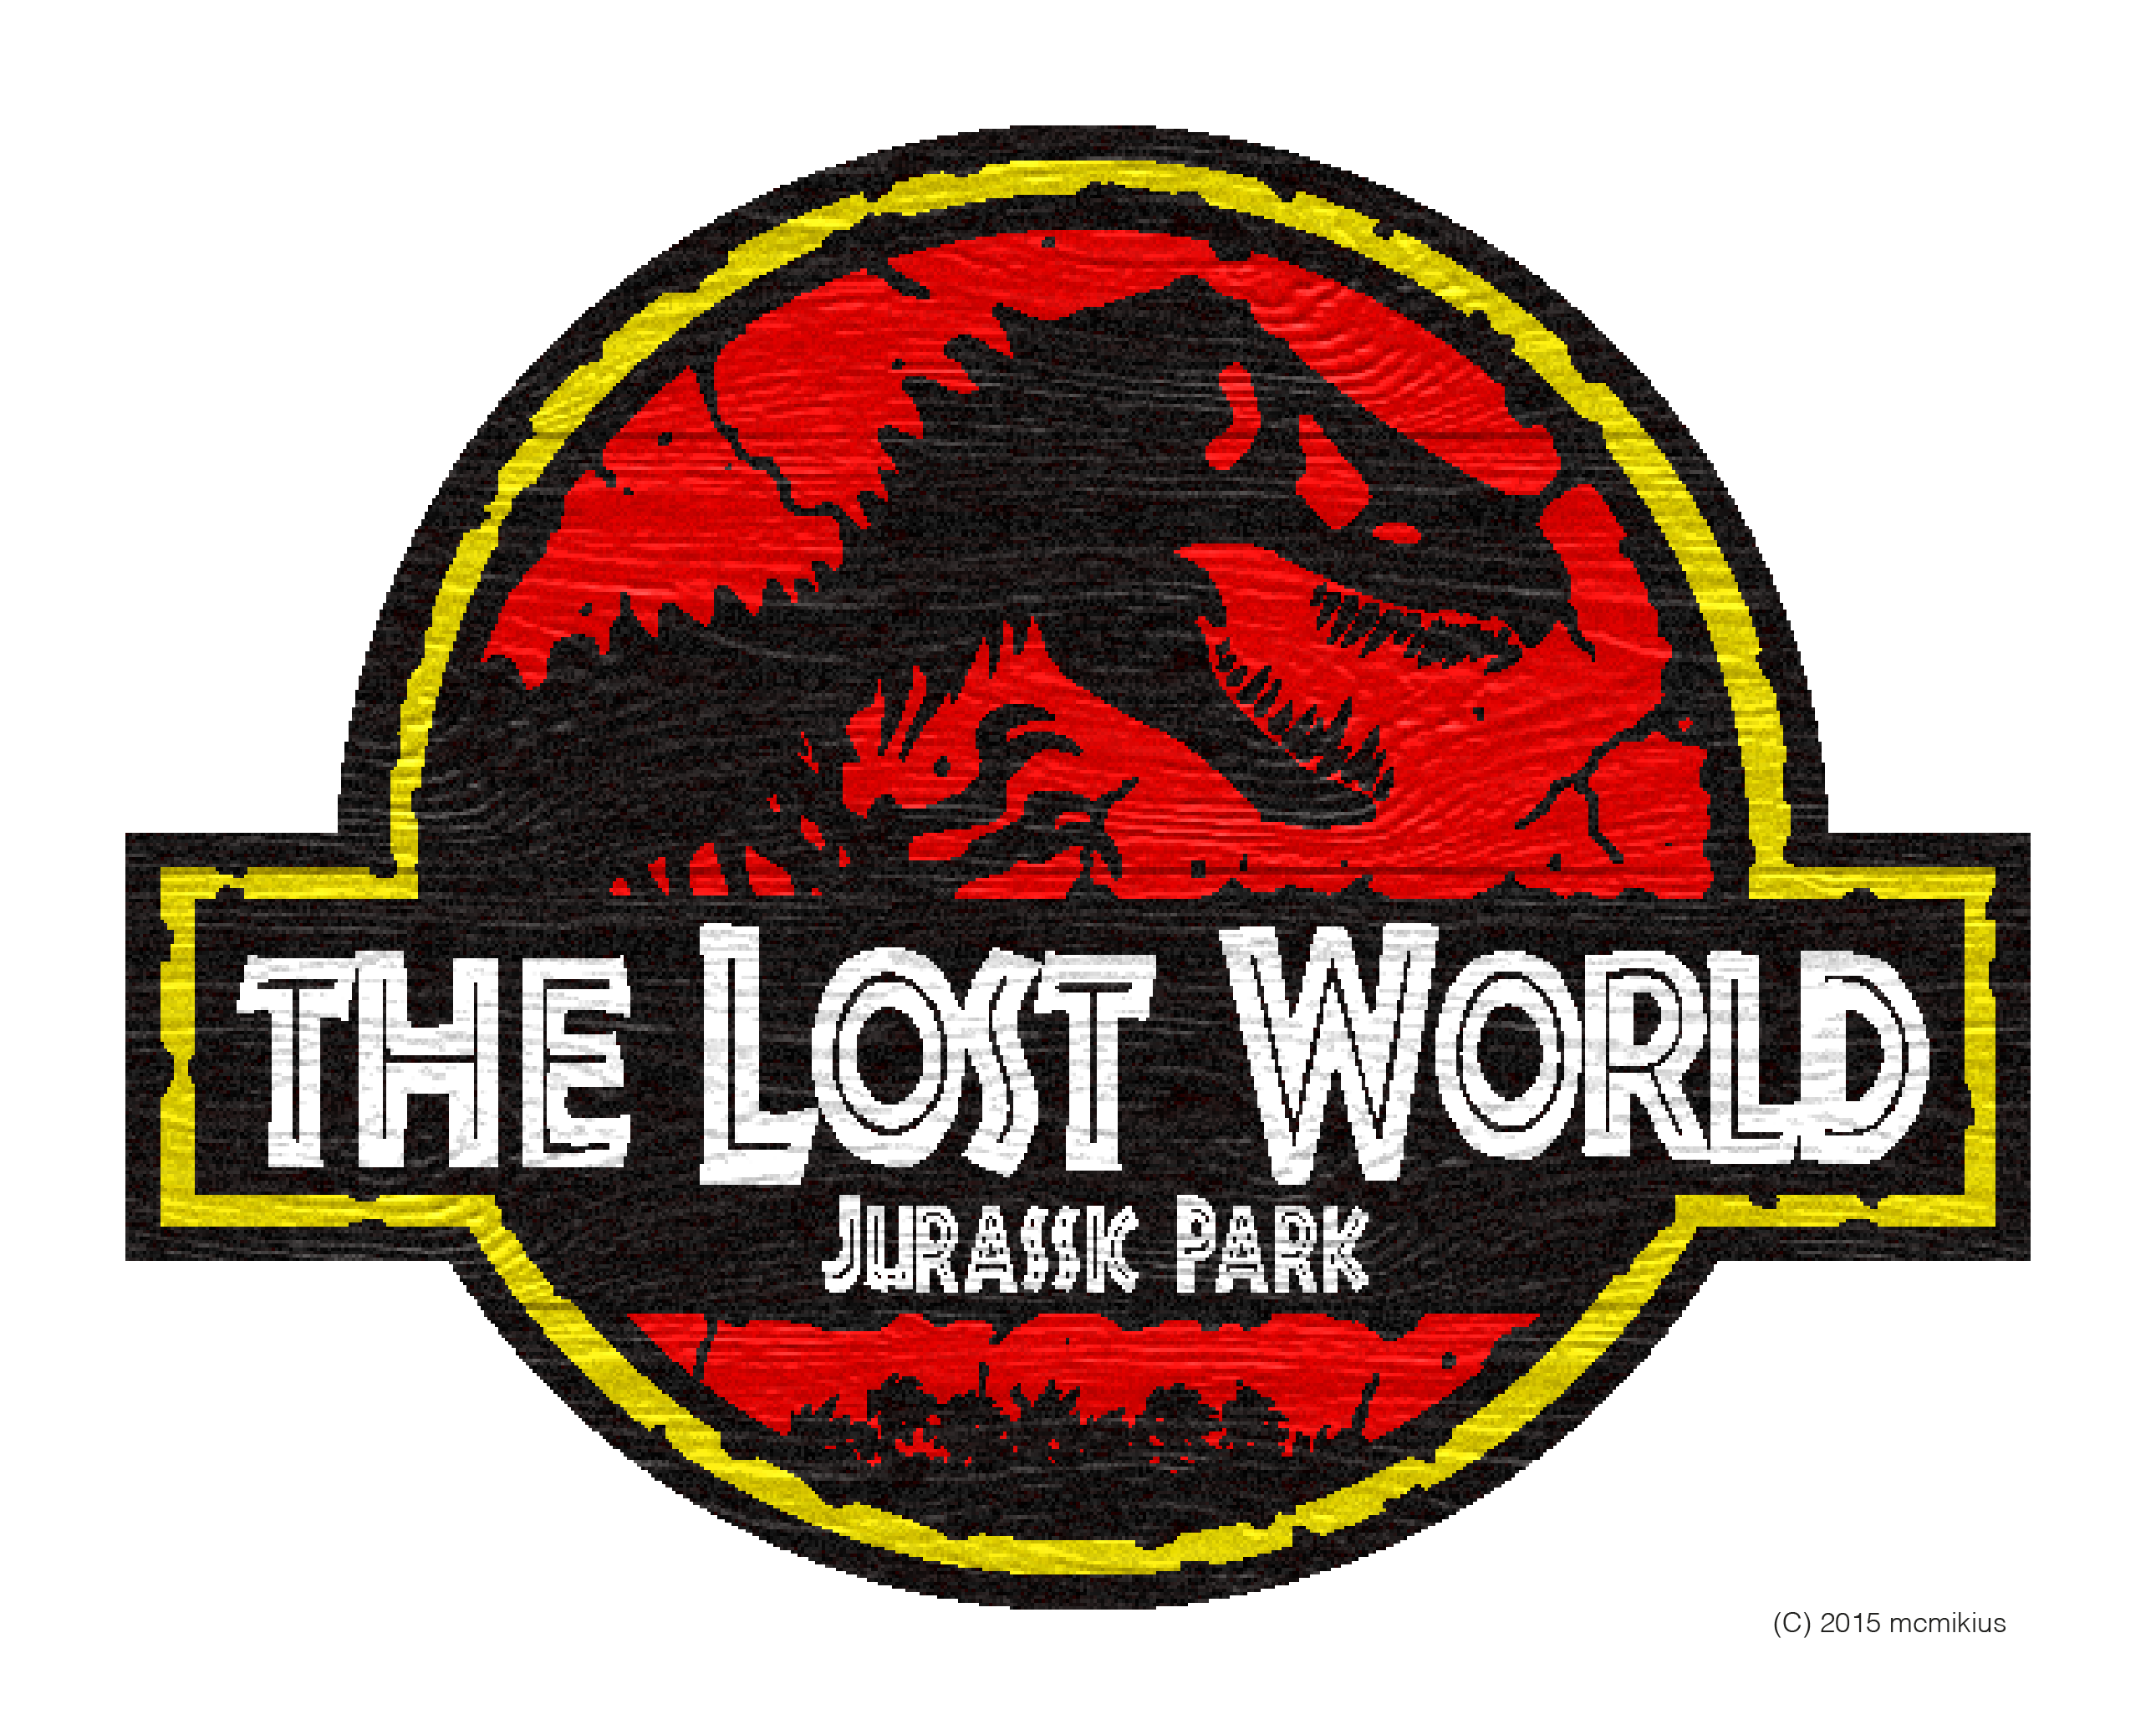 The Lost World Jurassic Park Logo ver 2